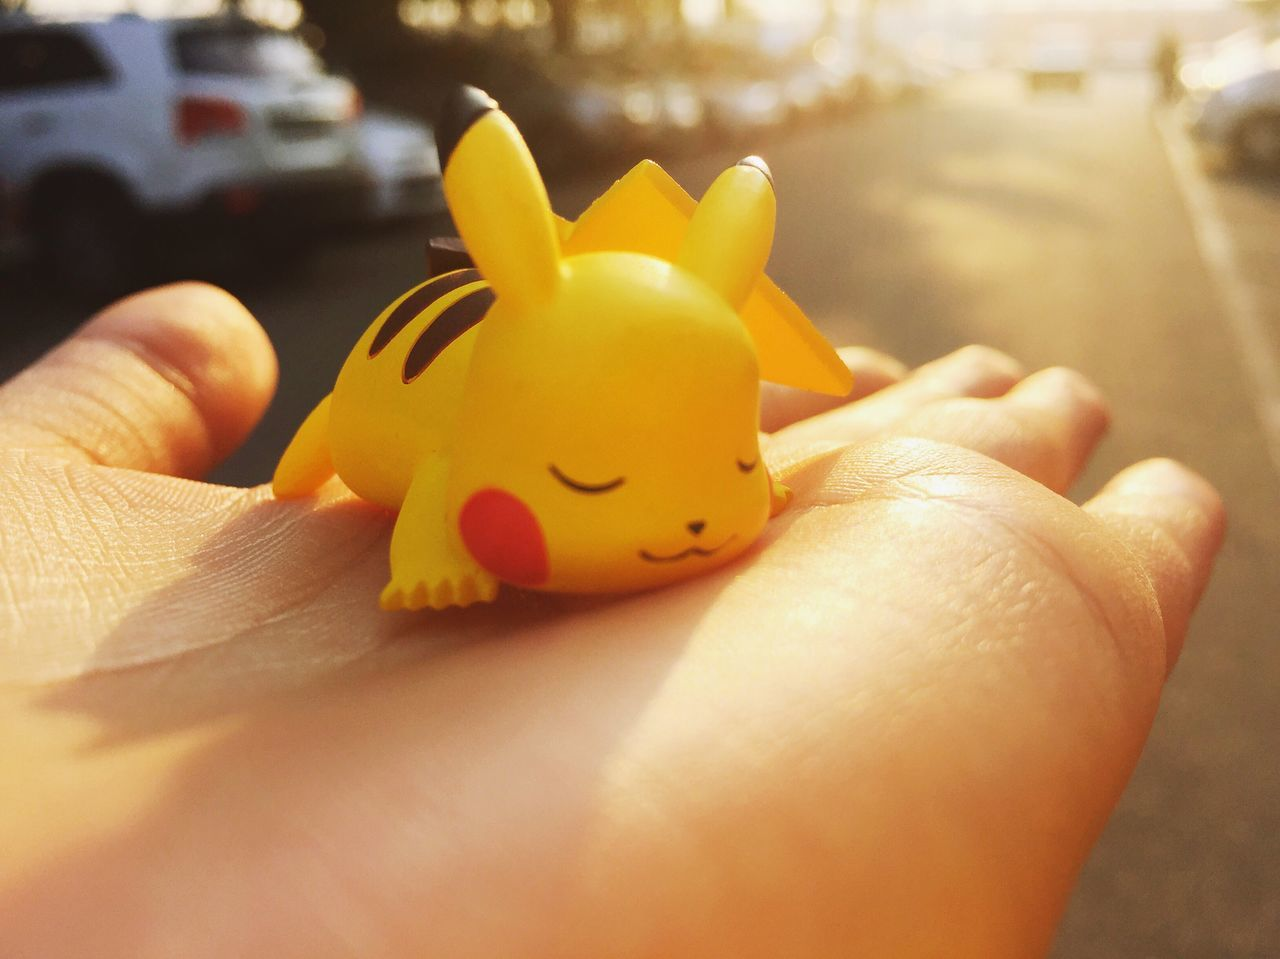 Pika! Human Hand Close-up Holding Sunlight Yellow Poketmonster Pikachu Pika Pika ♥ Pigure Sleeping Sunshine Comfortable Naptime